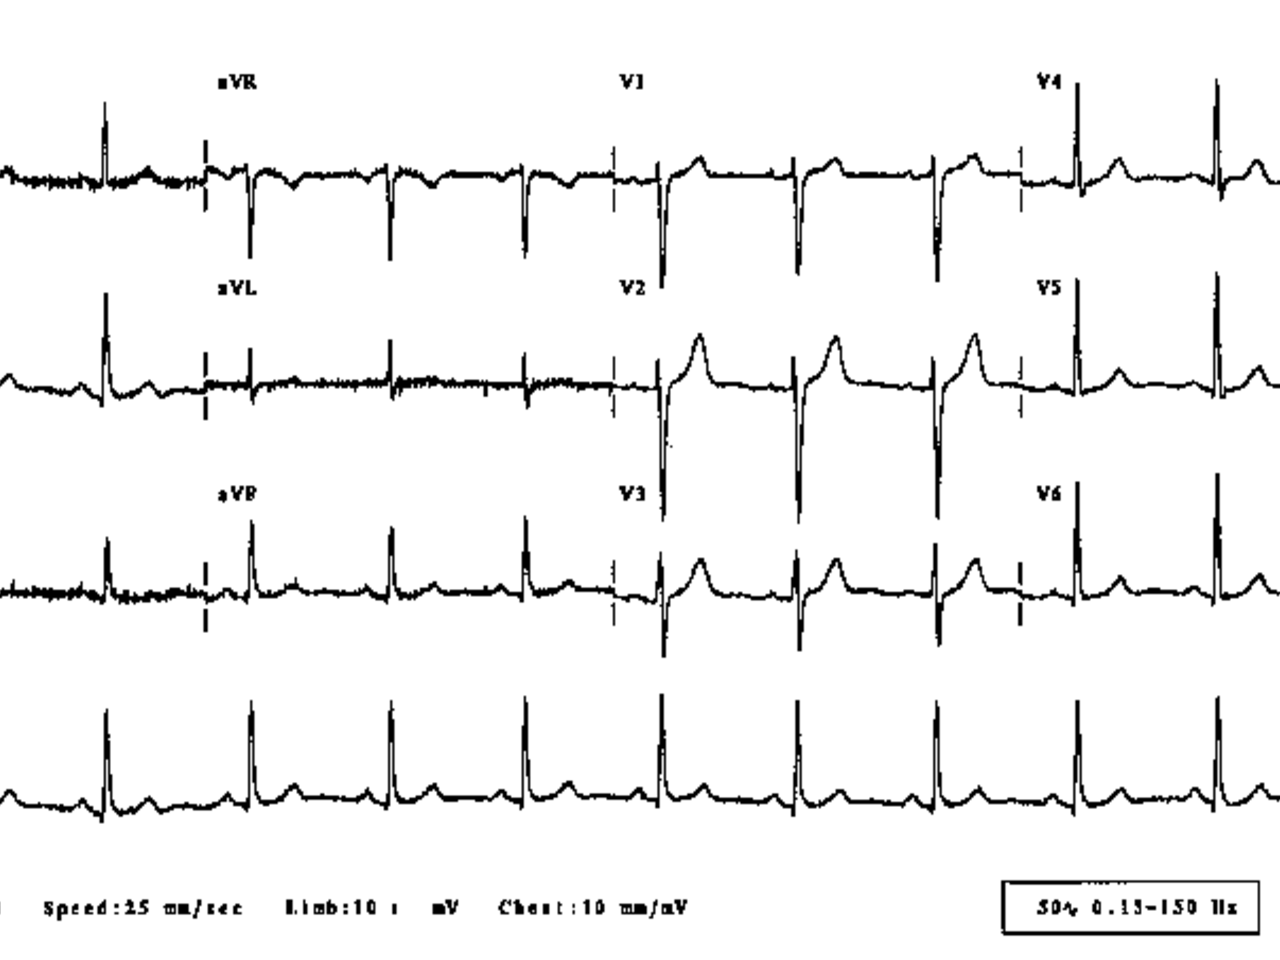 ECG Reading AI